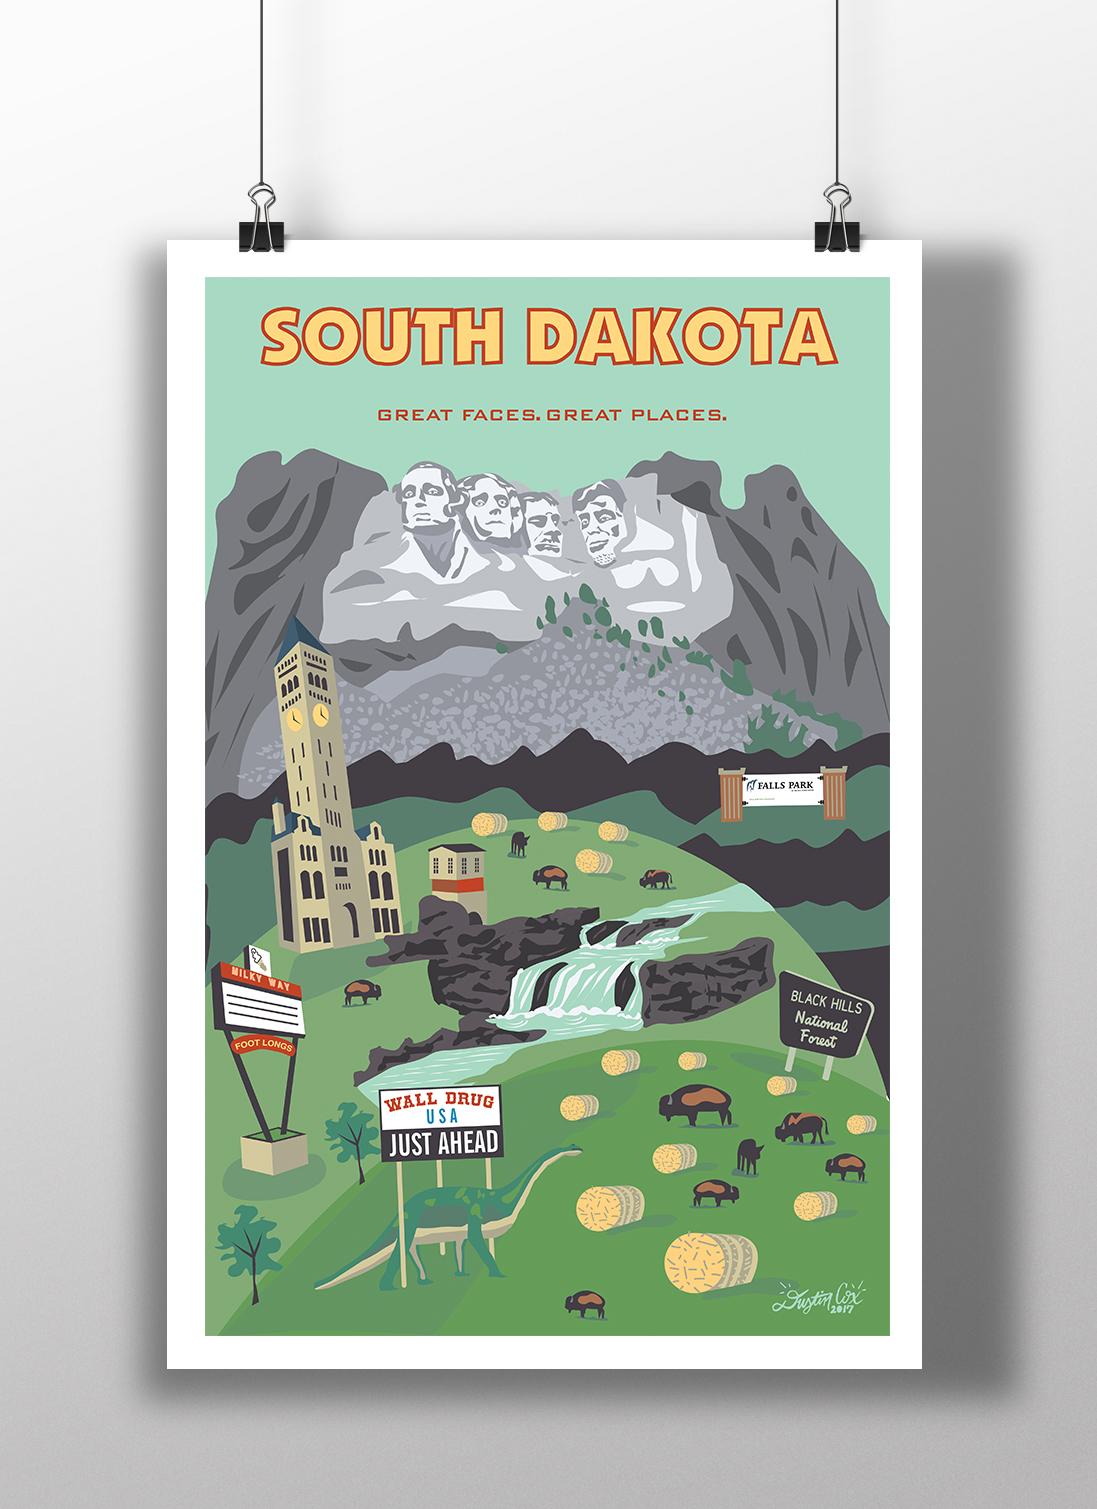 South Dakota State Poster